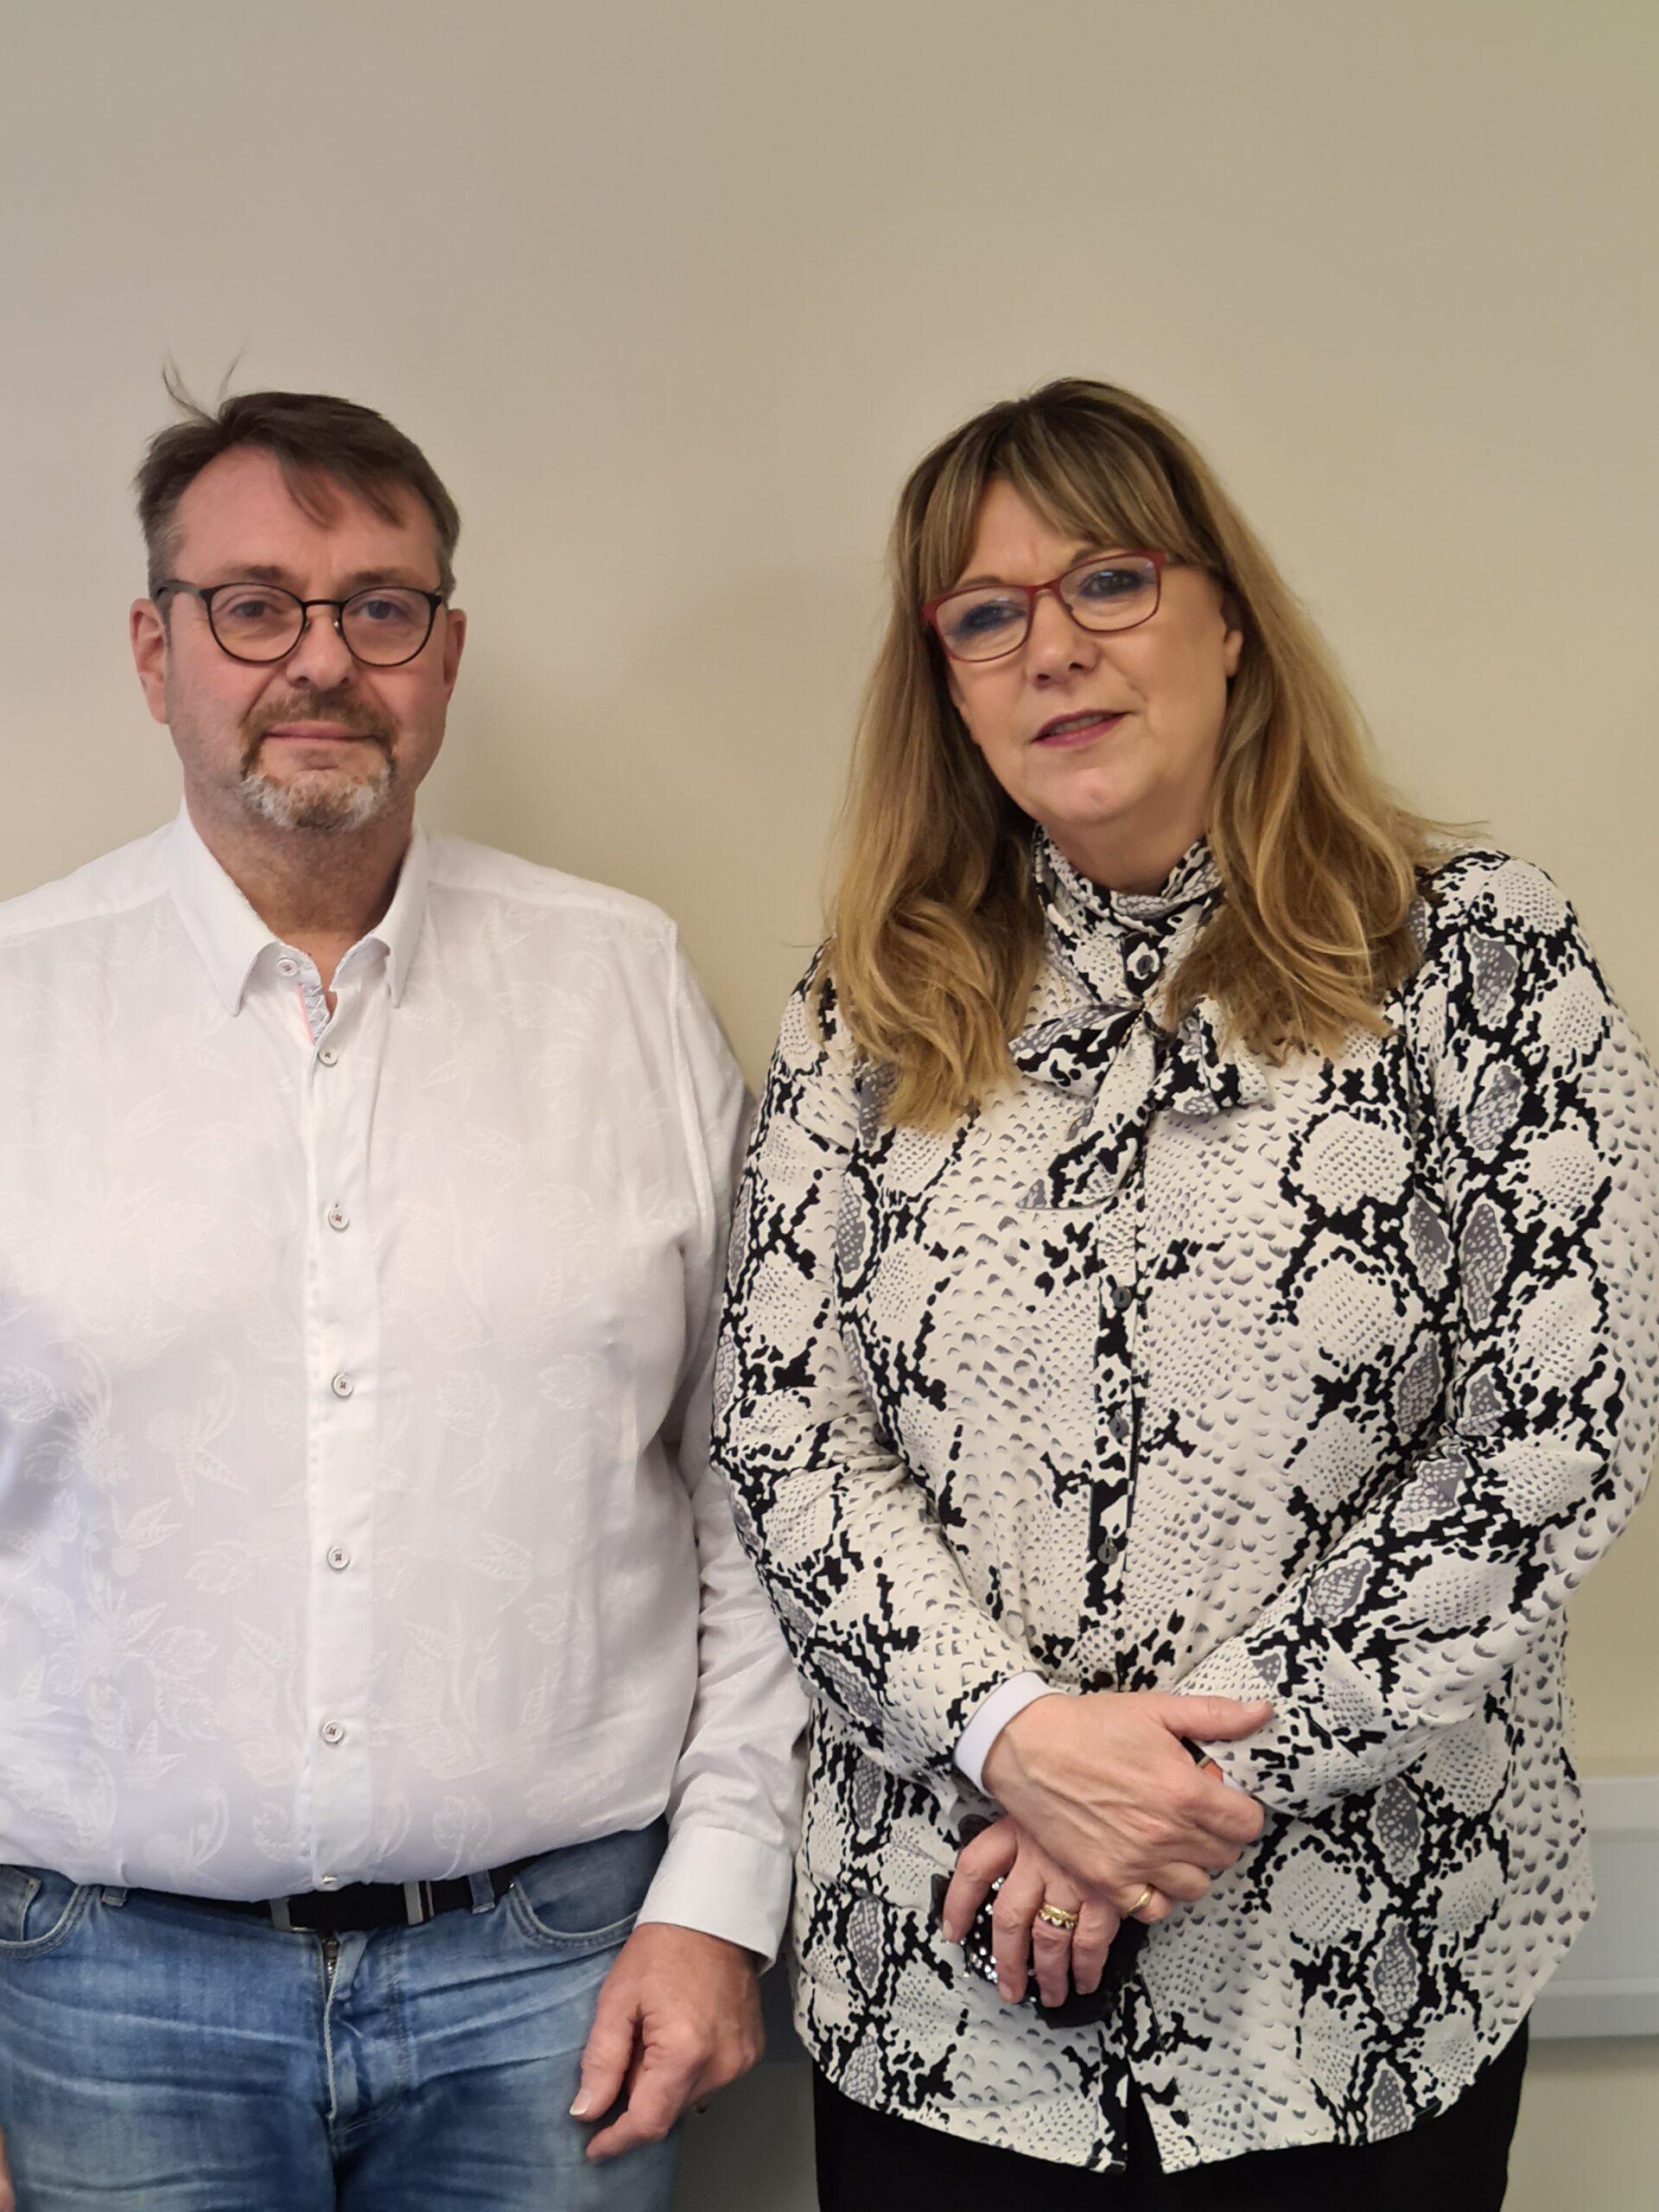 Owners of Professional Hygiene Sarah & Paul